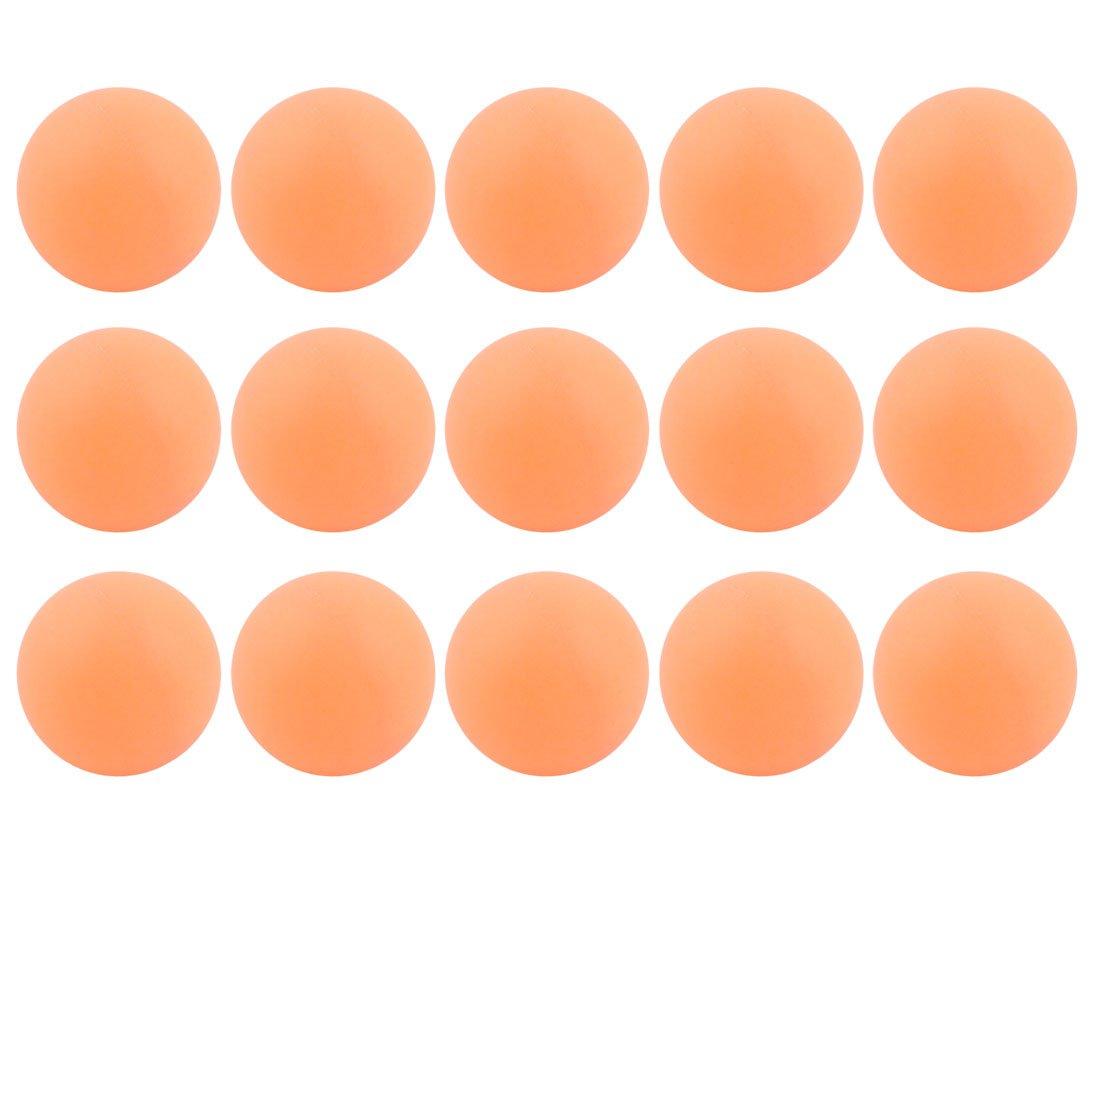 Uxcell RecreationalレジャーテーブルテニストレーニングPing Pong Ballsオレンジ15個   B01A8L8SFY